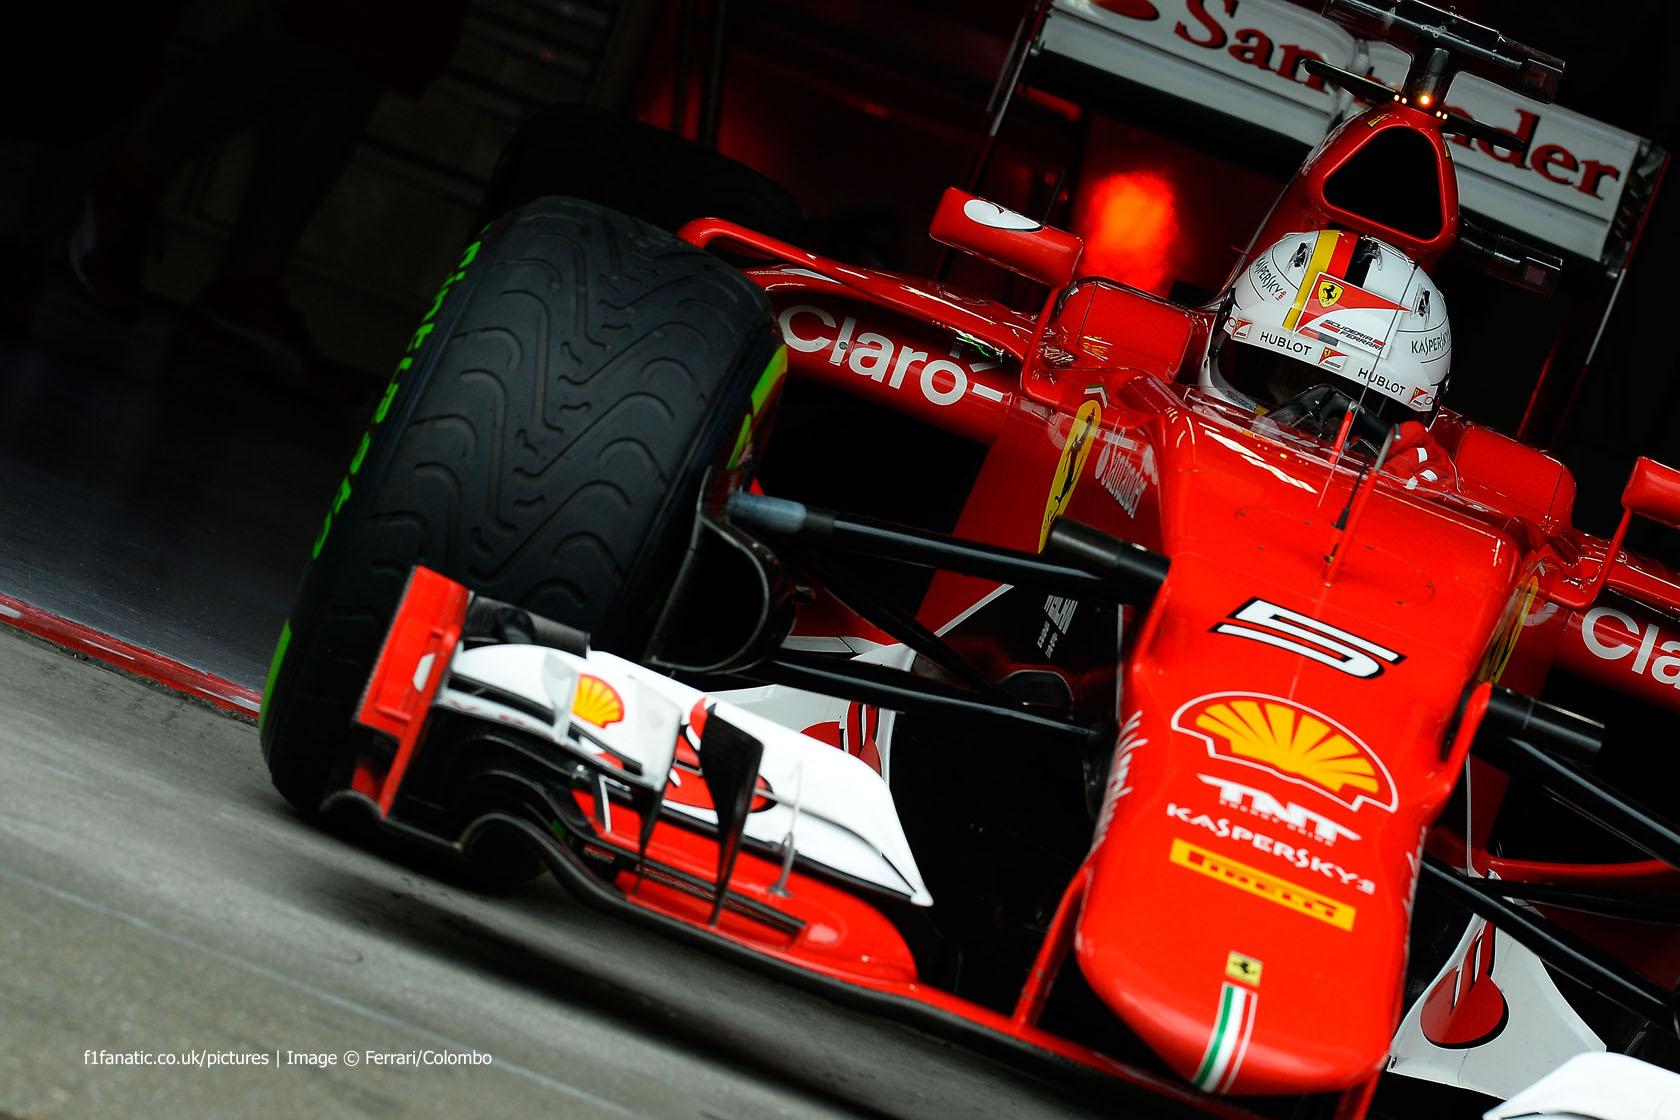 Ferrari F1 Wallpapers Vehicles Hq Ferrari F1 Pictures 4k